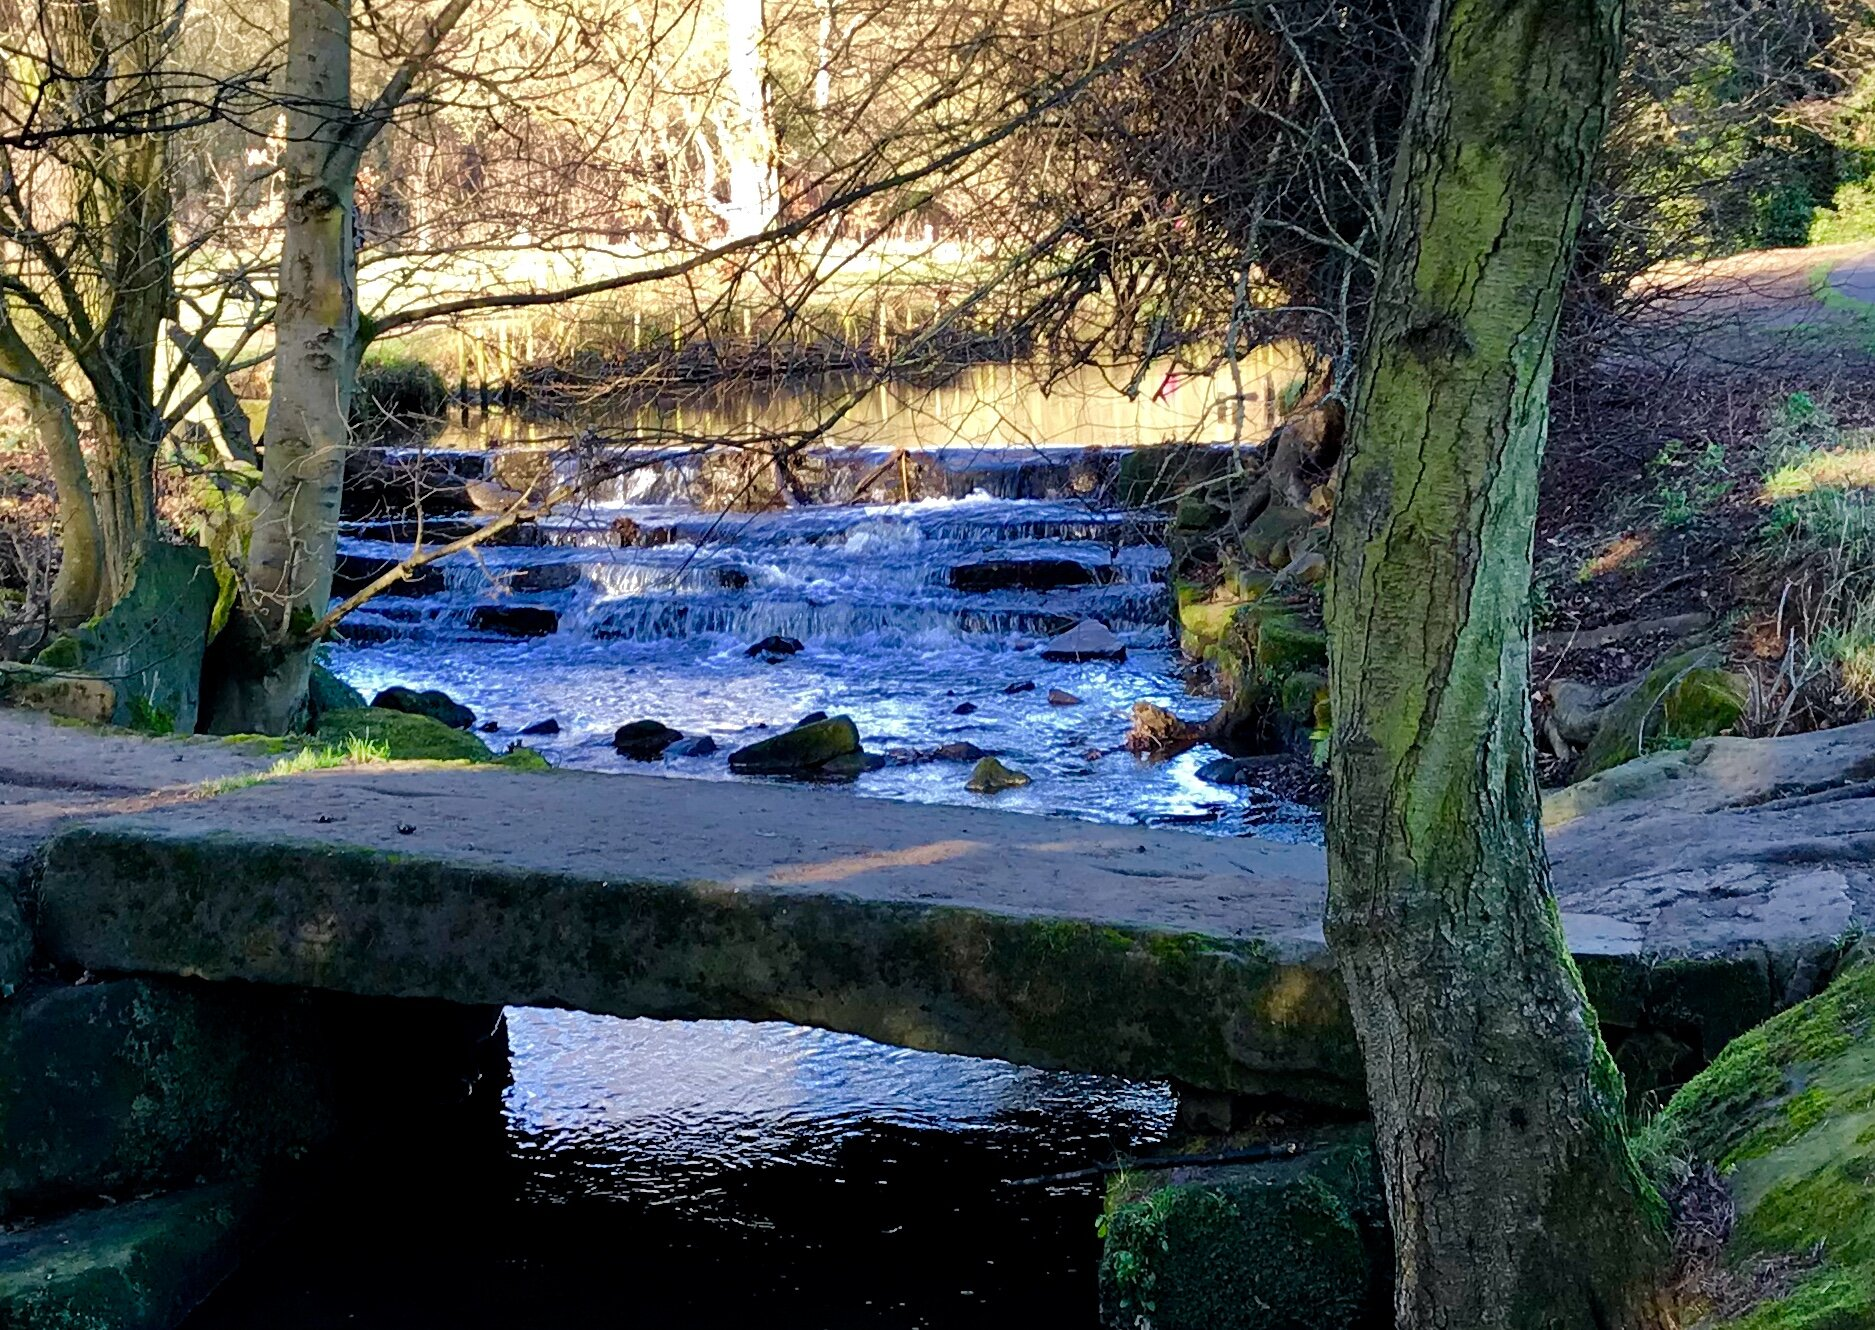 Clapper bridge and weir, Meanwood Beck © HP